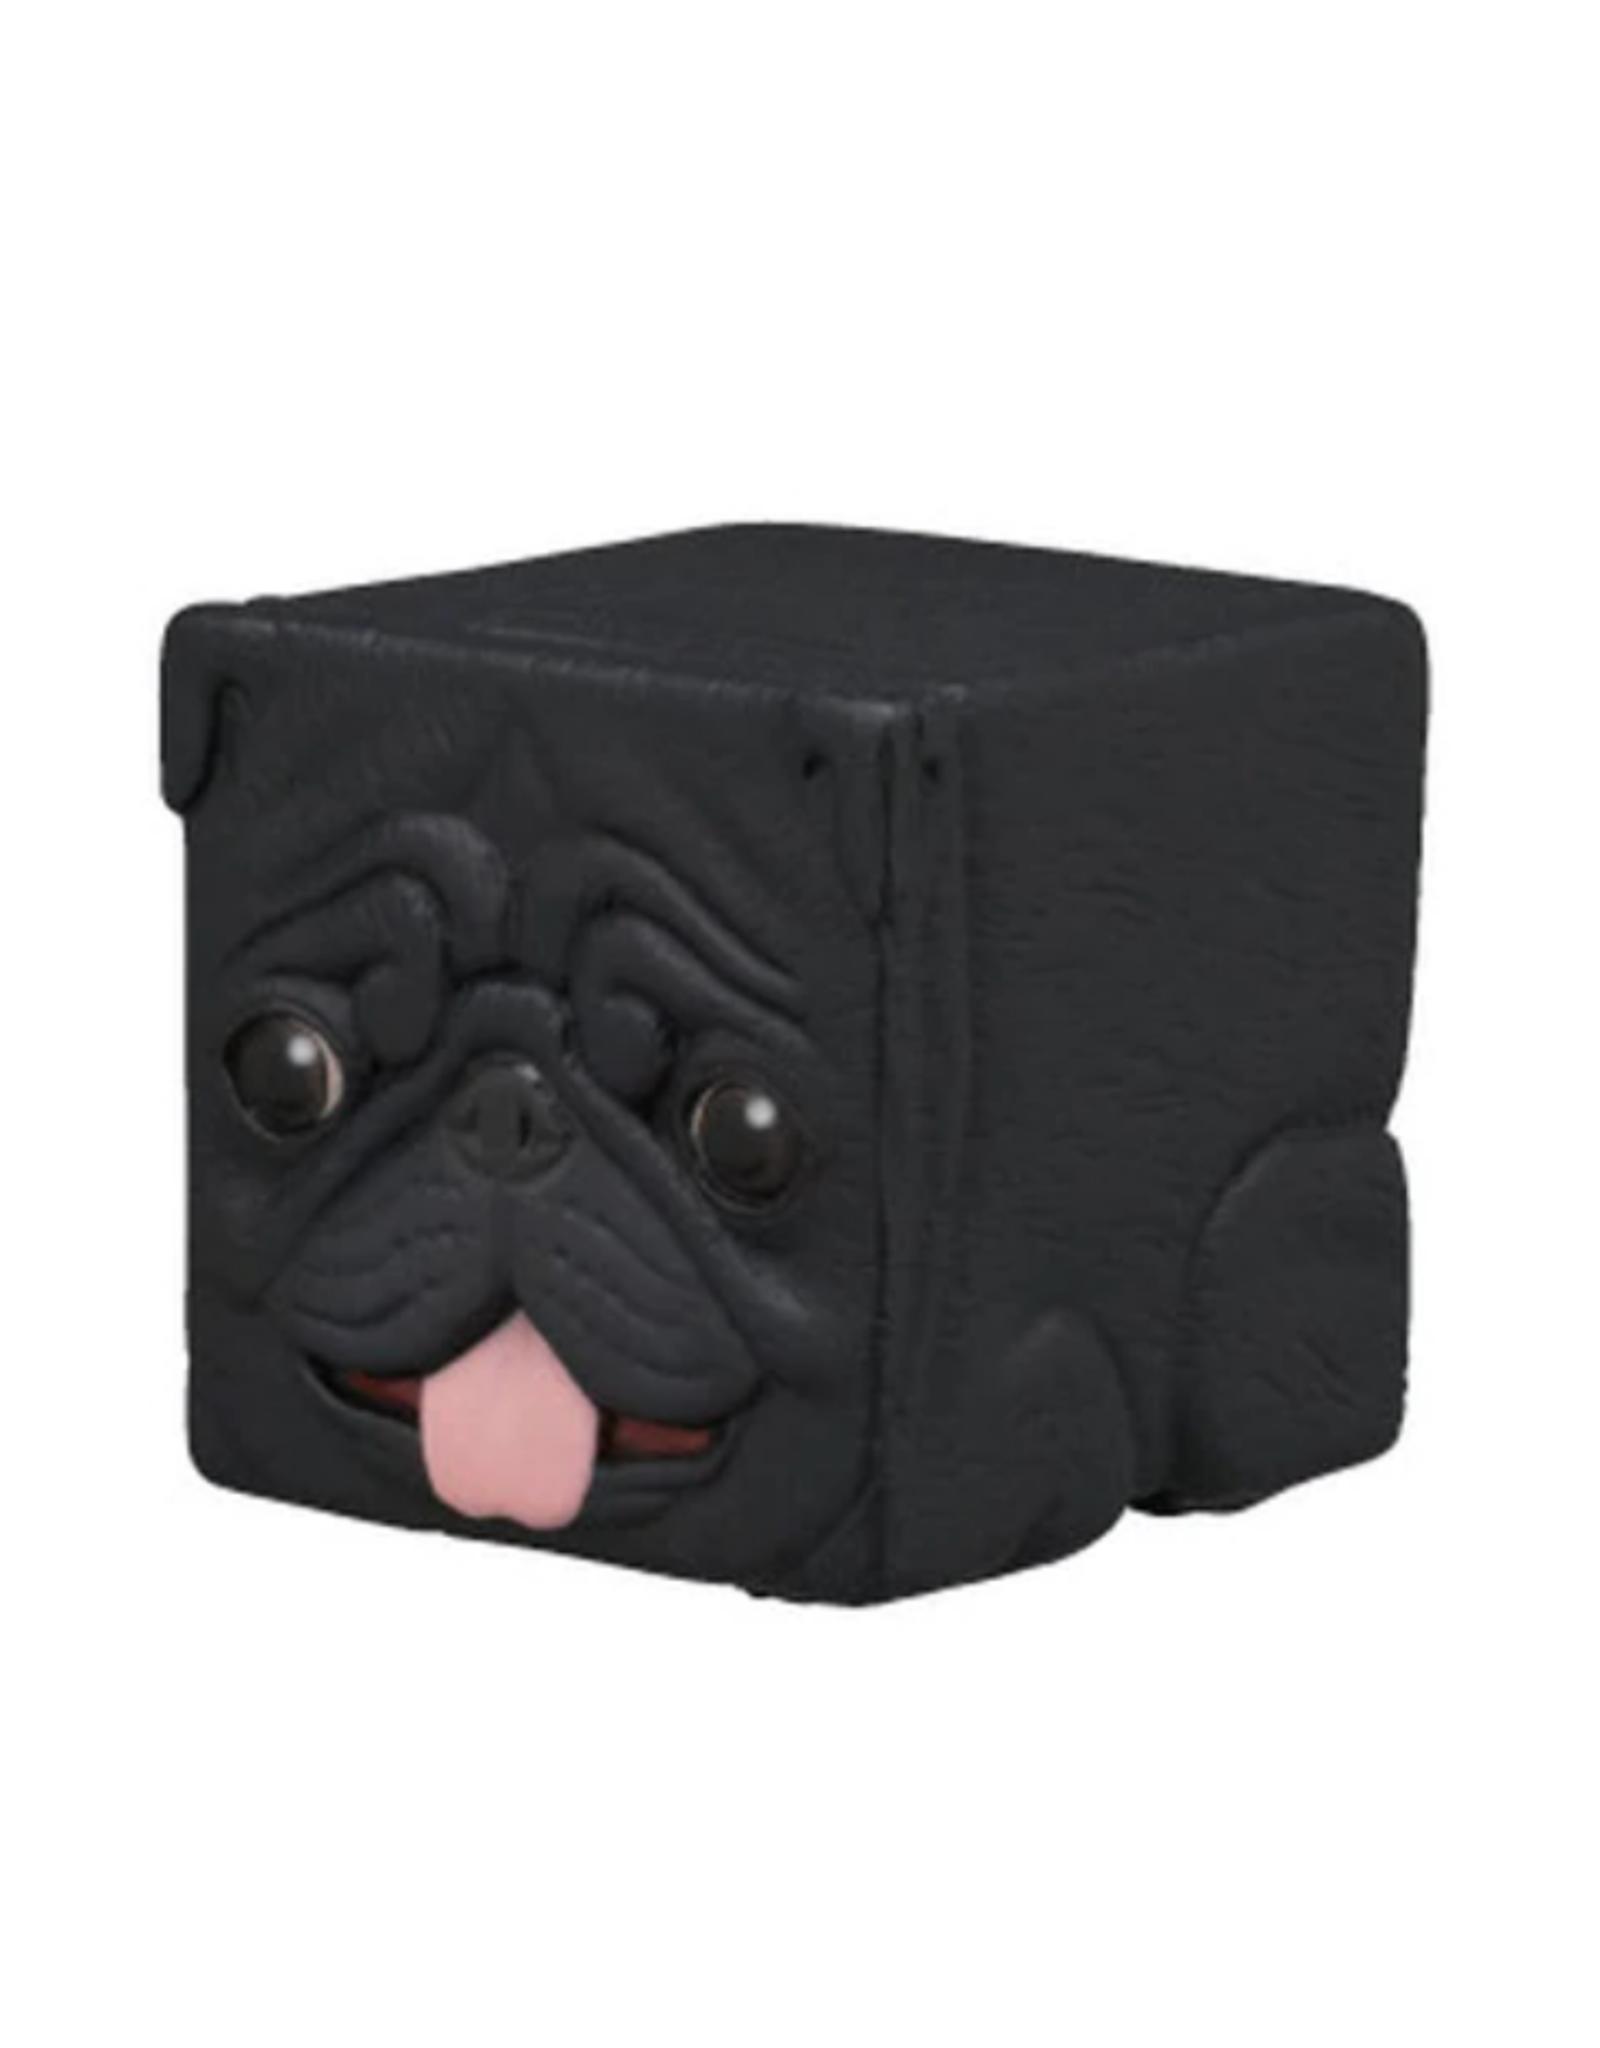 Cube Pug Blind Box